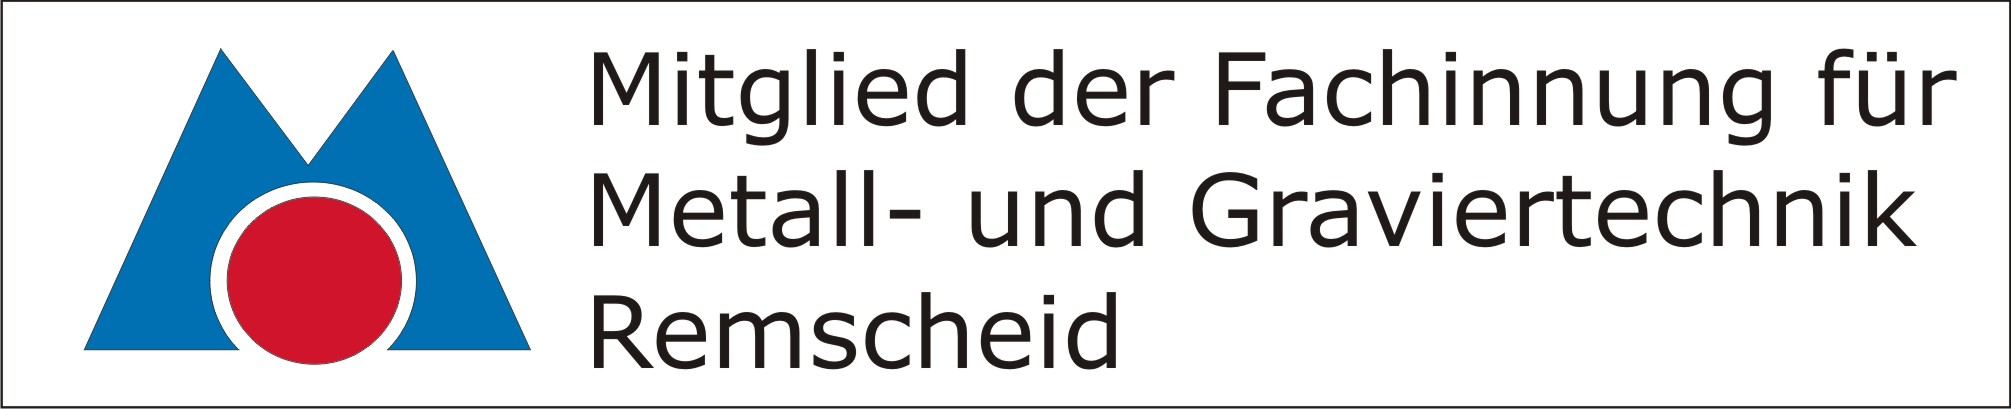 Wiegand GmbH bei WLW